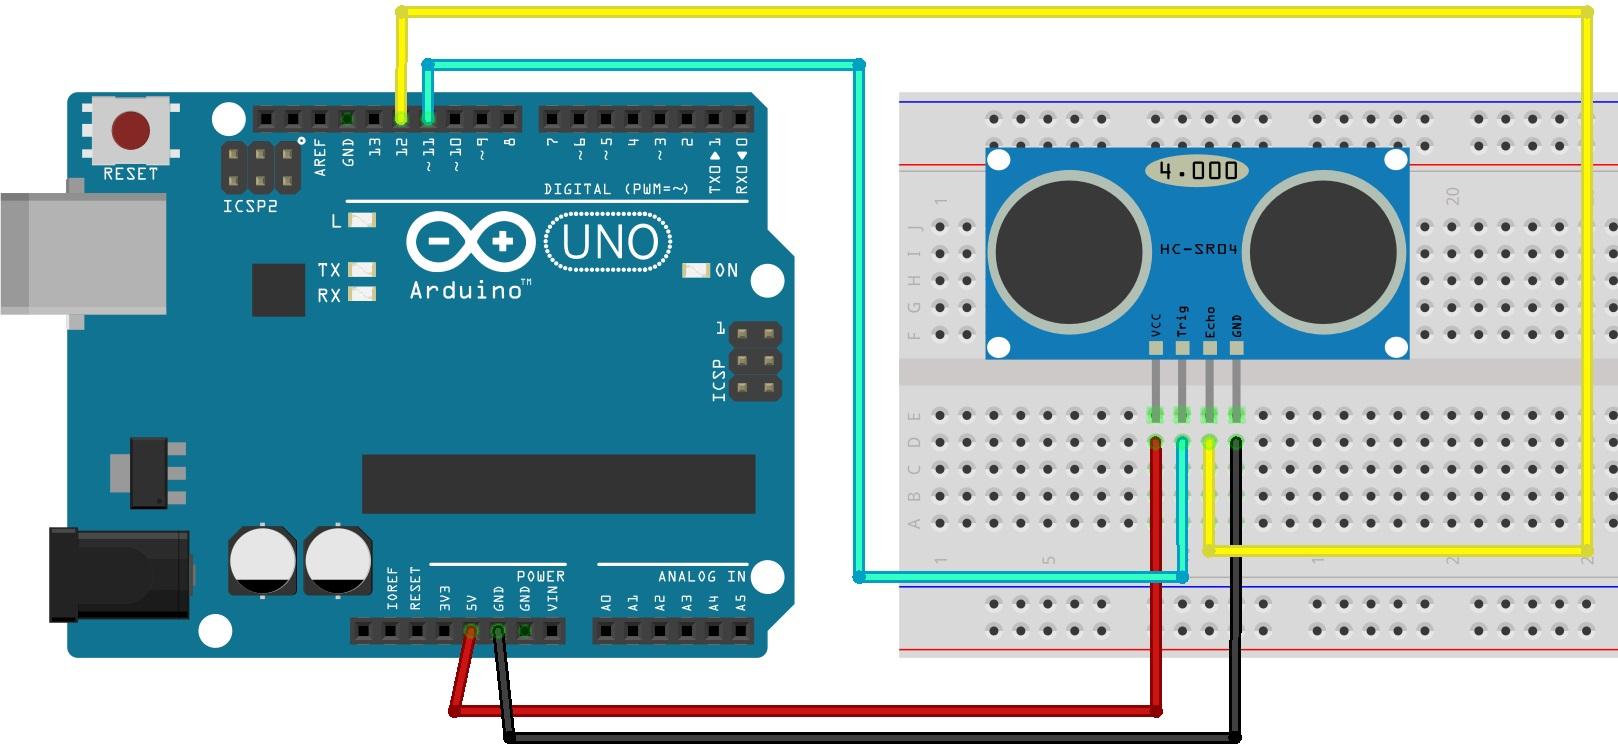 https://i2.wp.com/randomnerdtutorials.com/wp-content/uploads/2013/11/ultrasonic-sensor-with-arduino-hc-sr04.jpg